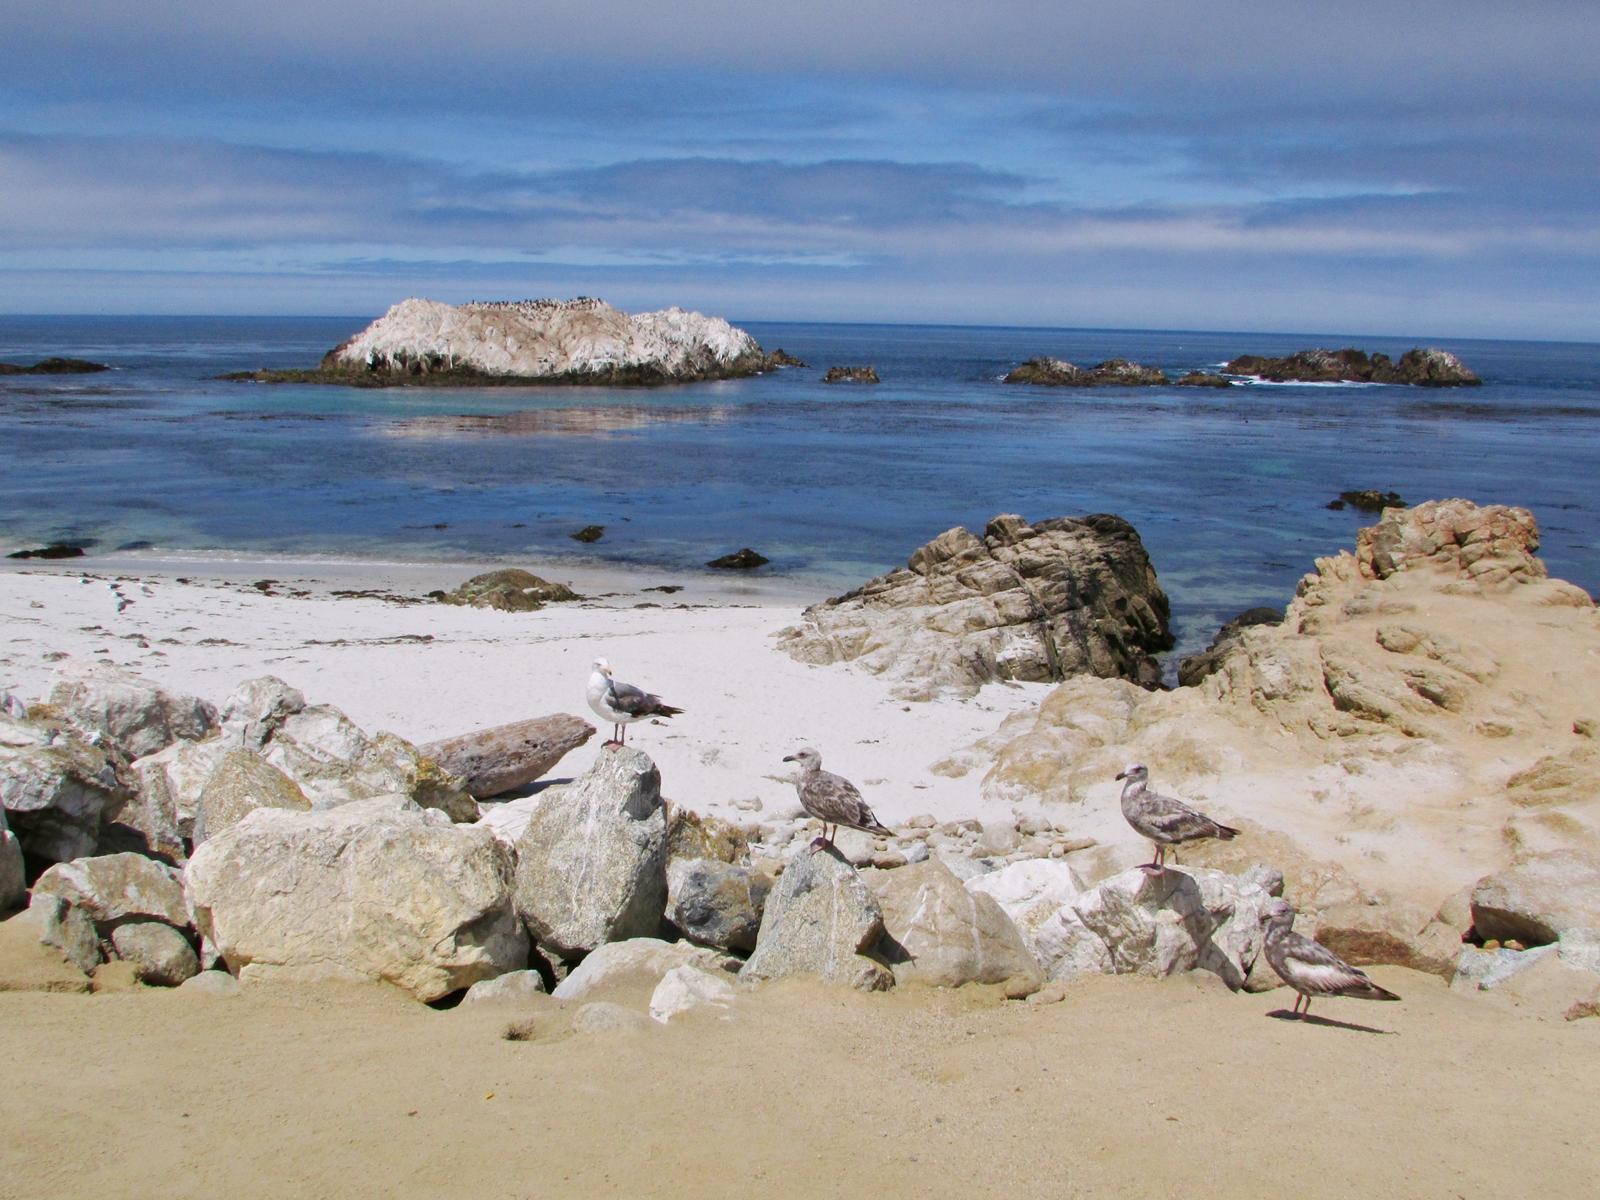 USA Rundreise - Amerika Westküste - 17-Mile Drive - Bird Rock - Fashionladyloves - Travelblog - Reise Blog